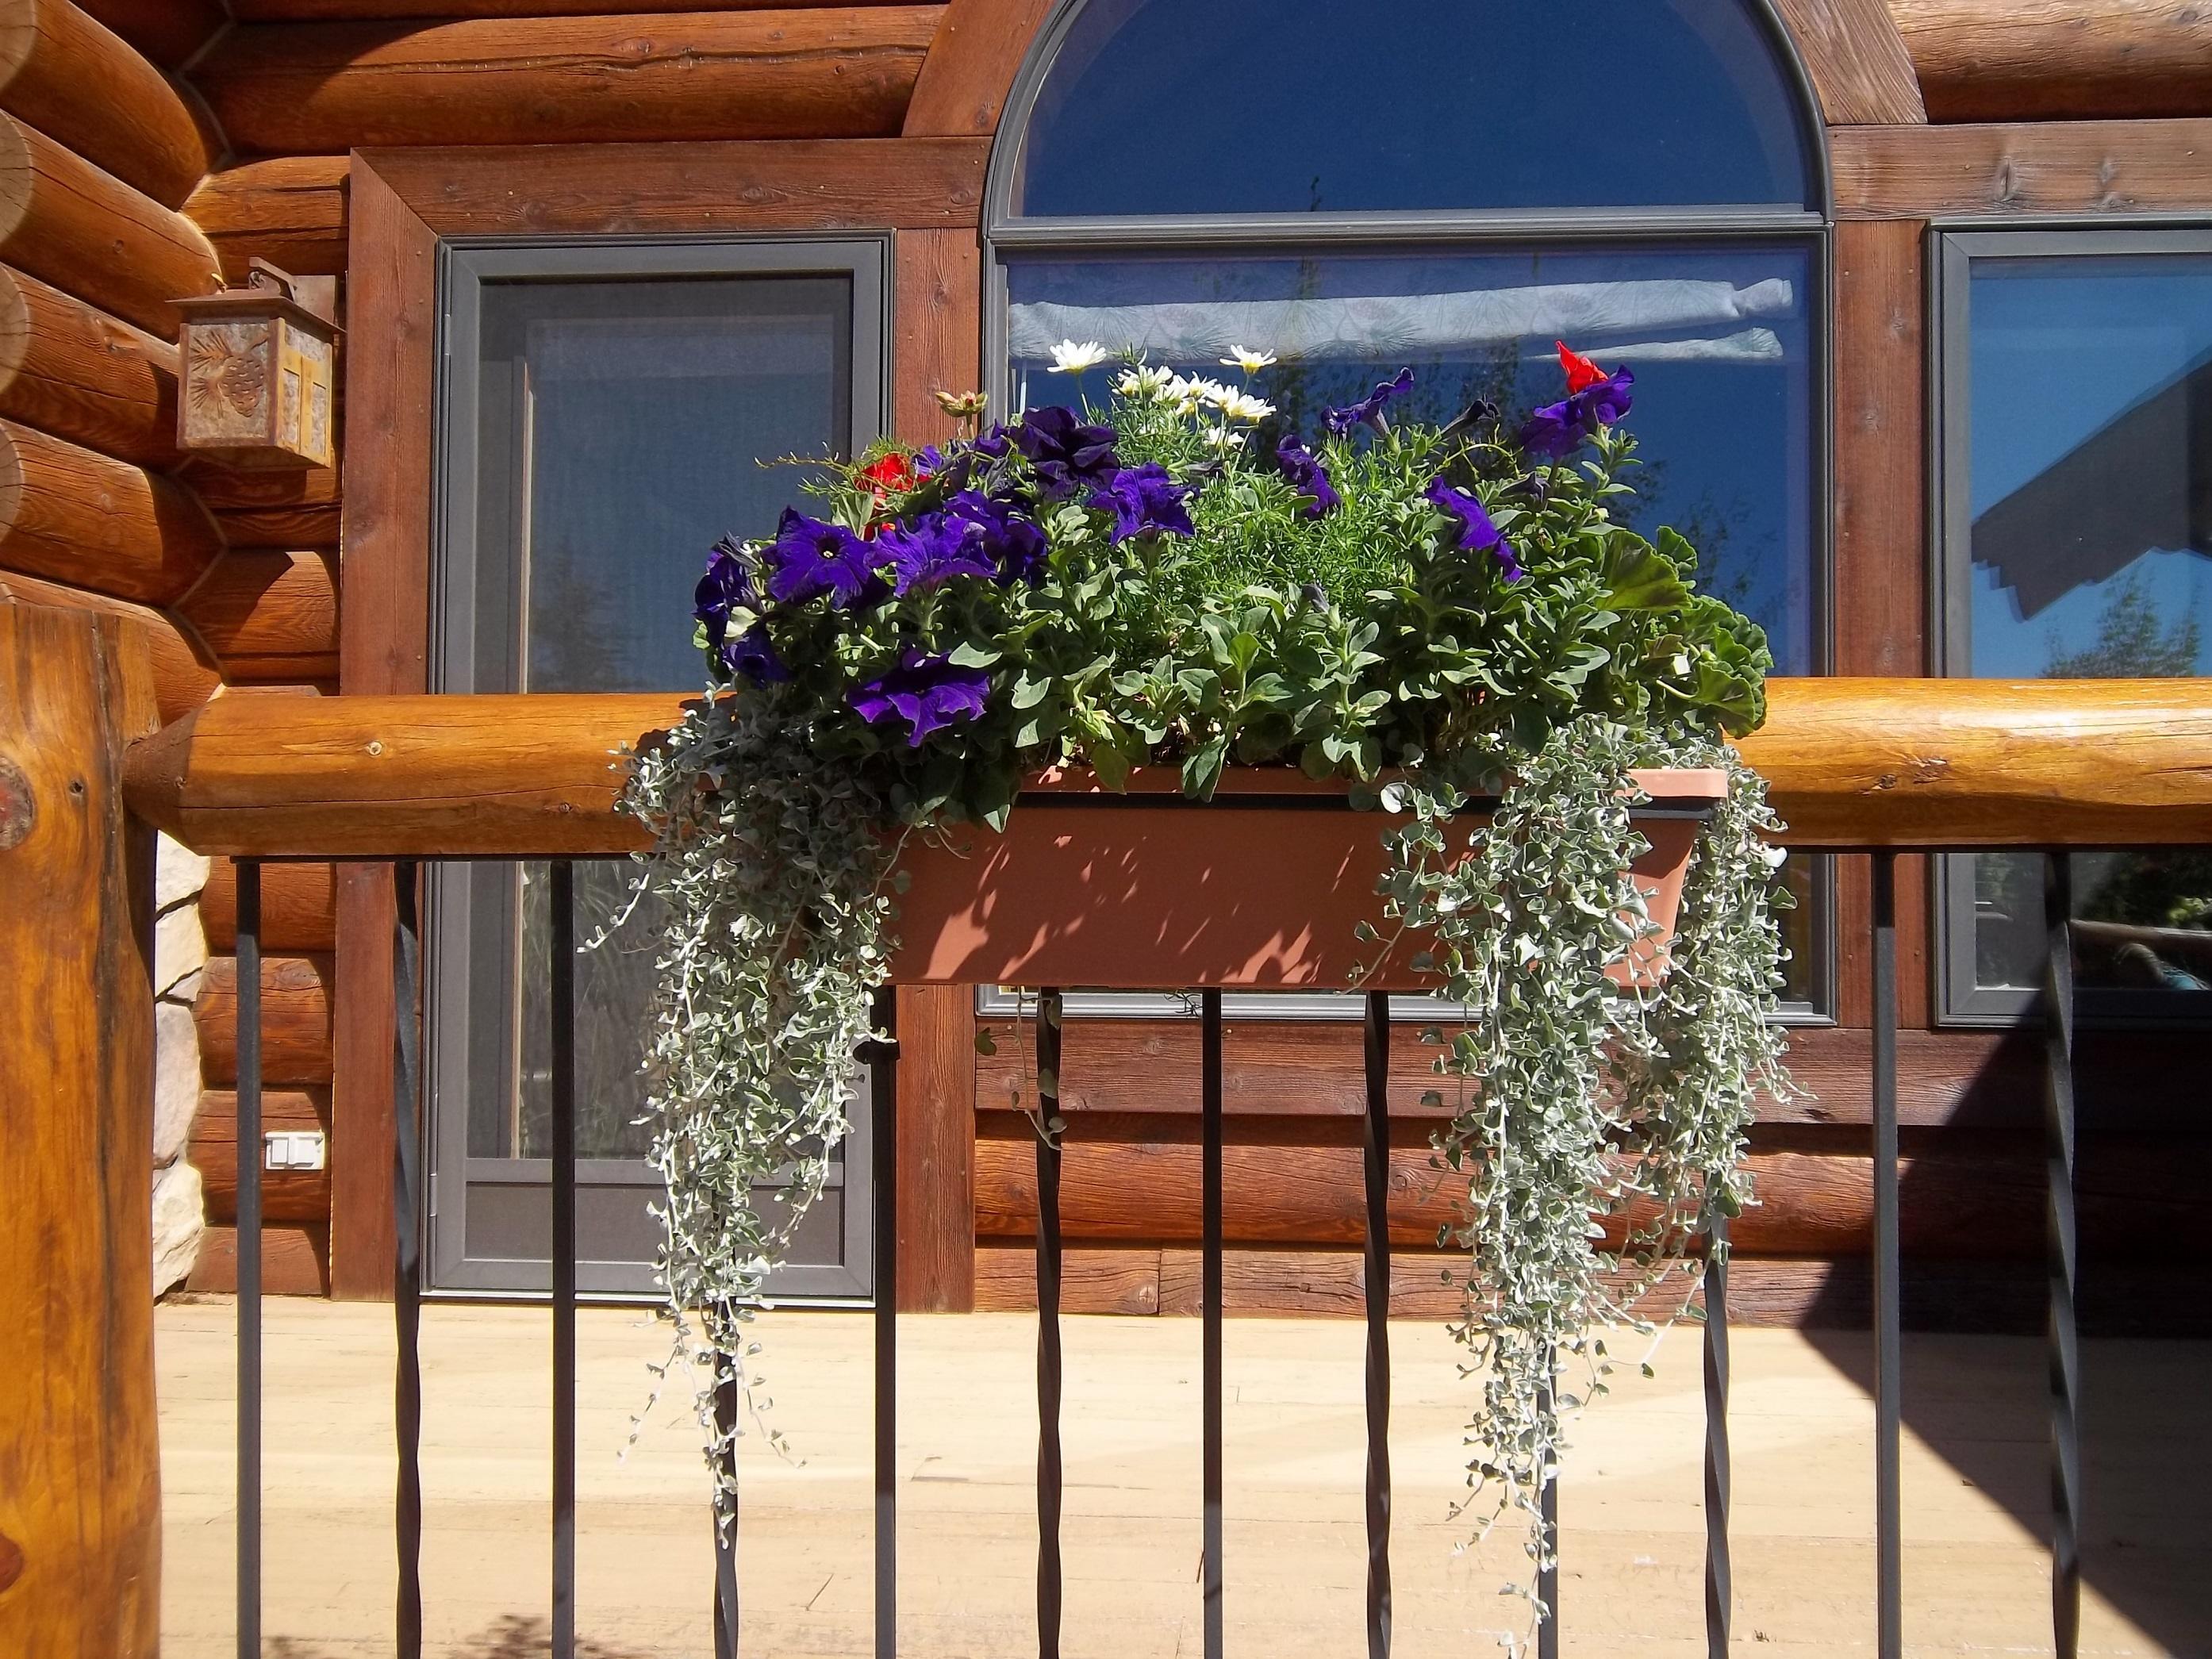 Floral Gardening, Inc